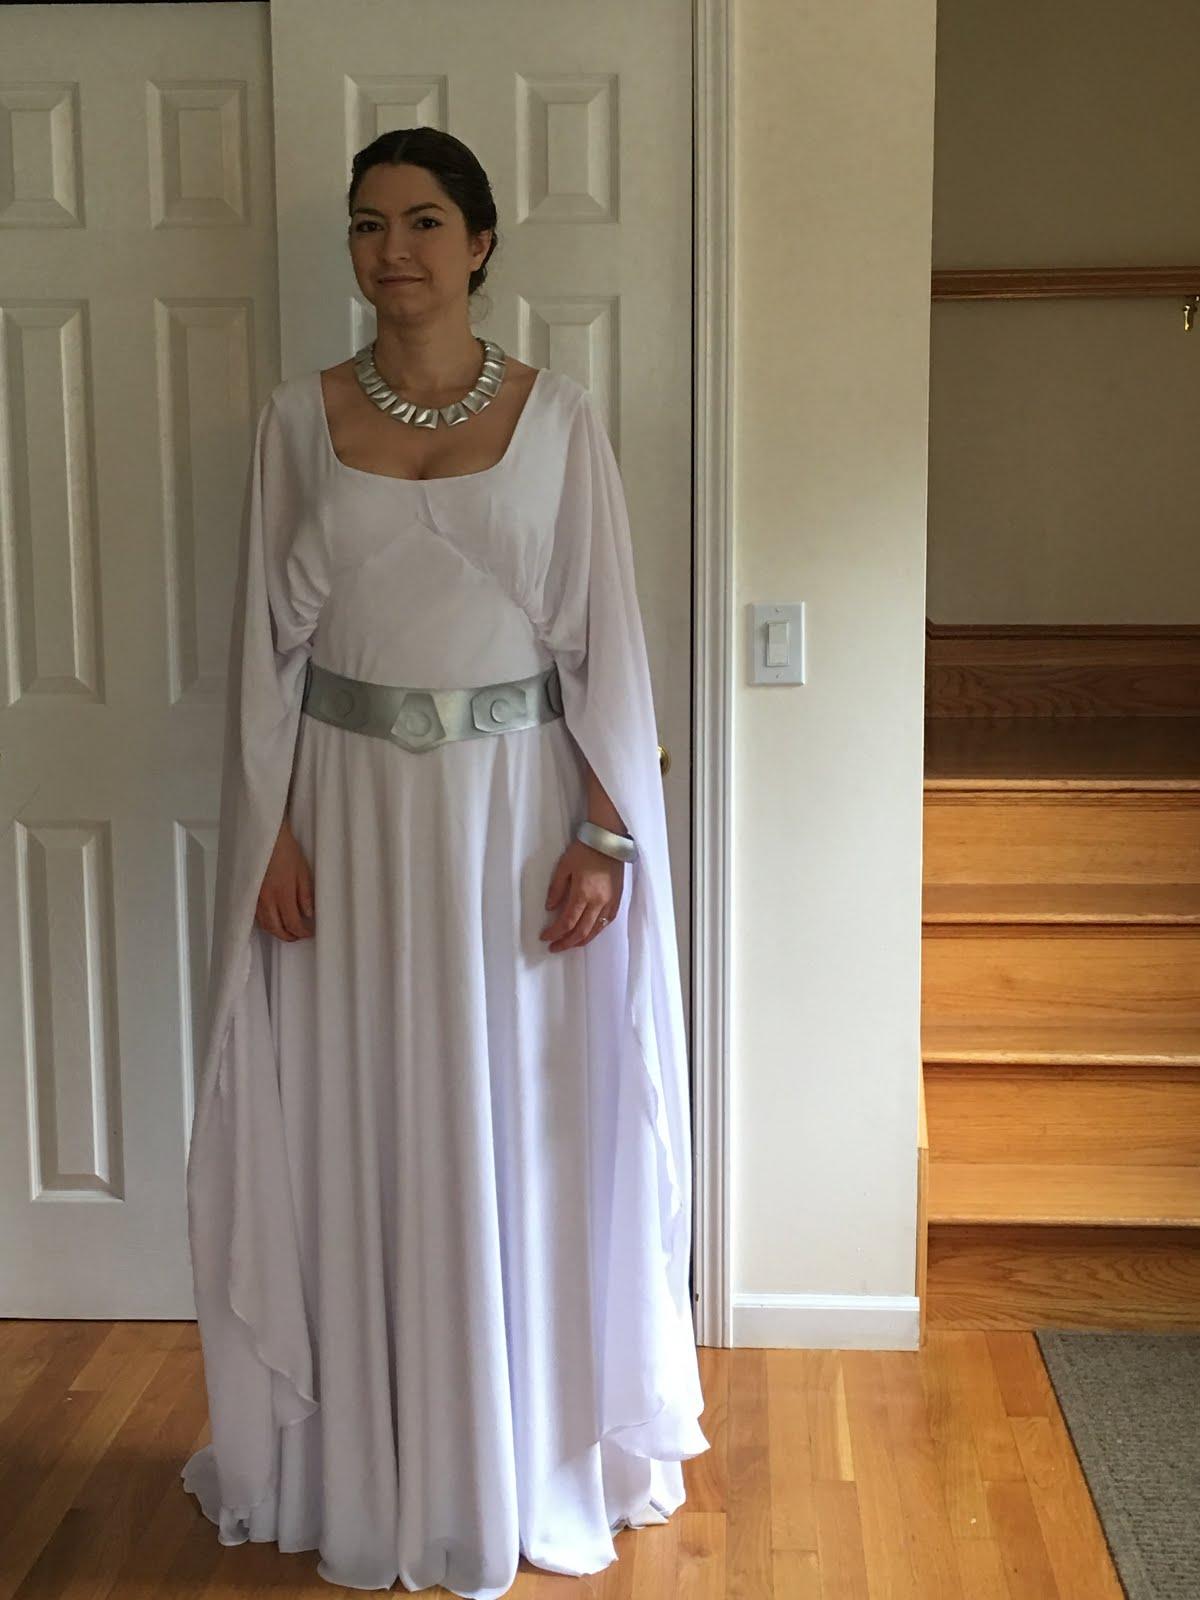 Sneak Peek: Princess Leia, Yavin Ceremony | Jen Eyre Cosplay